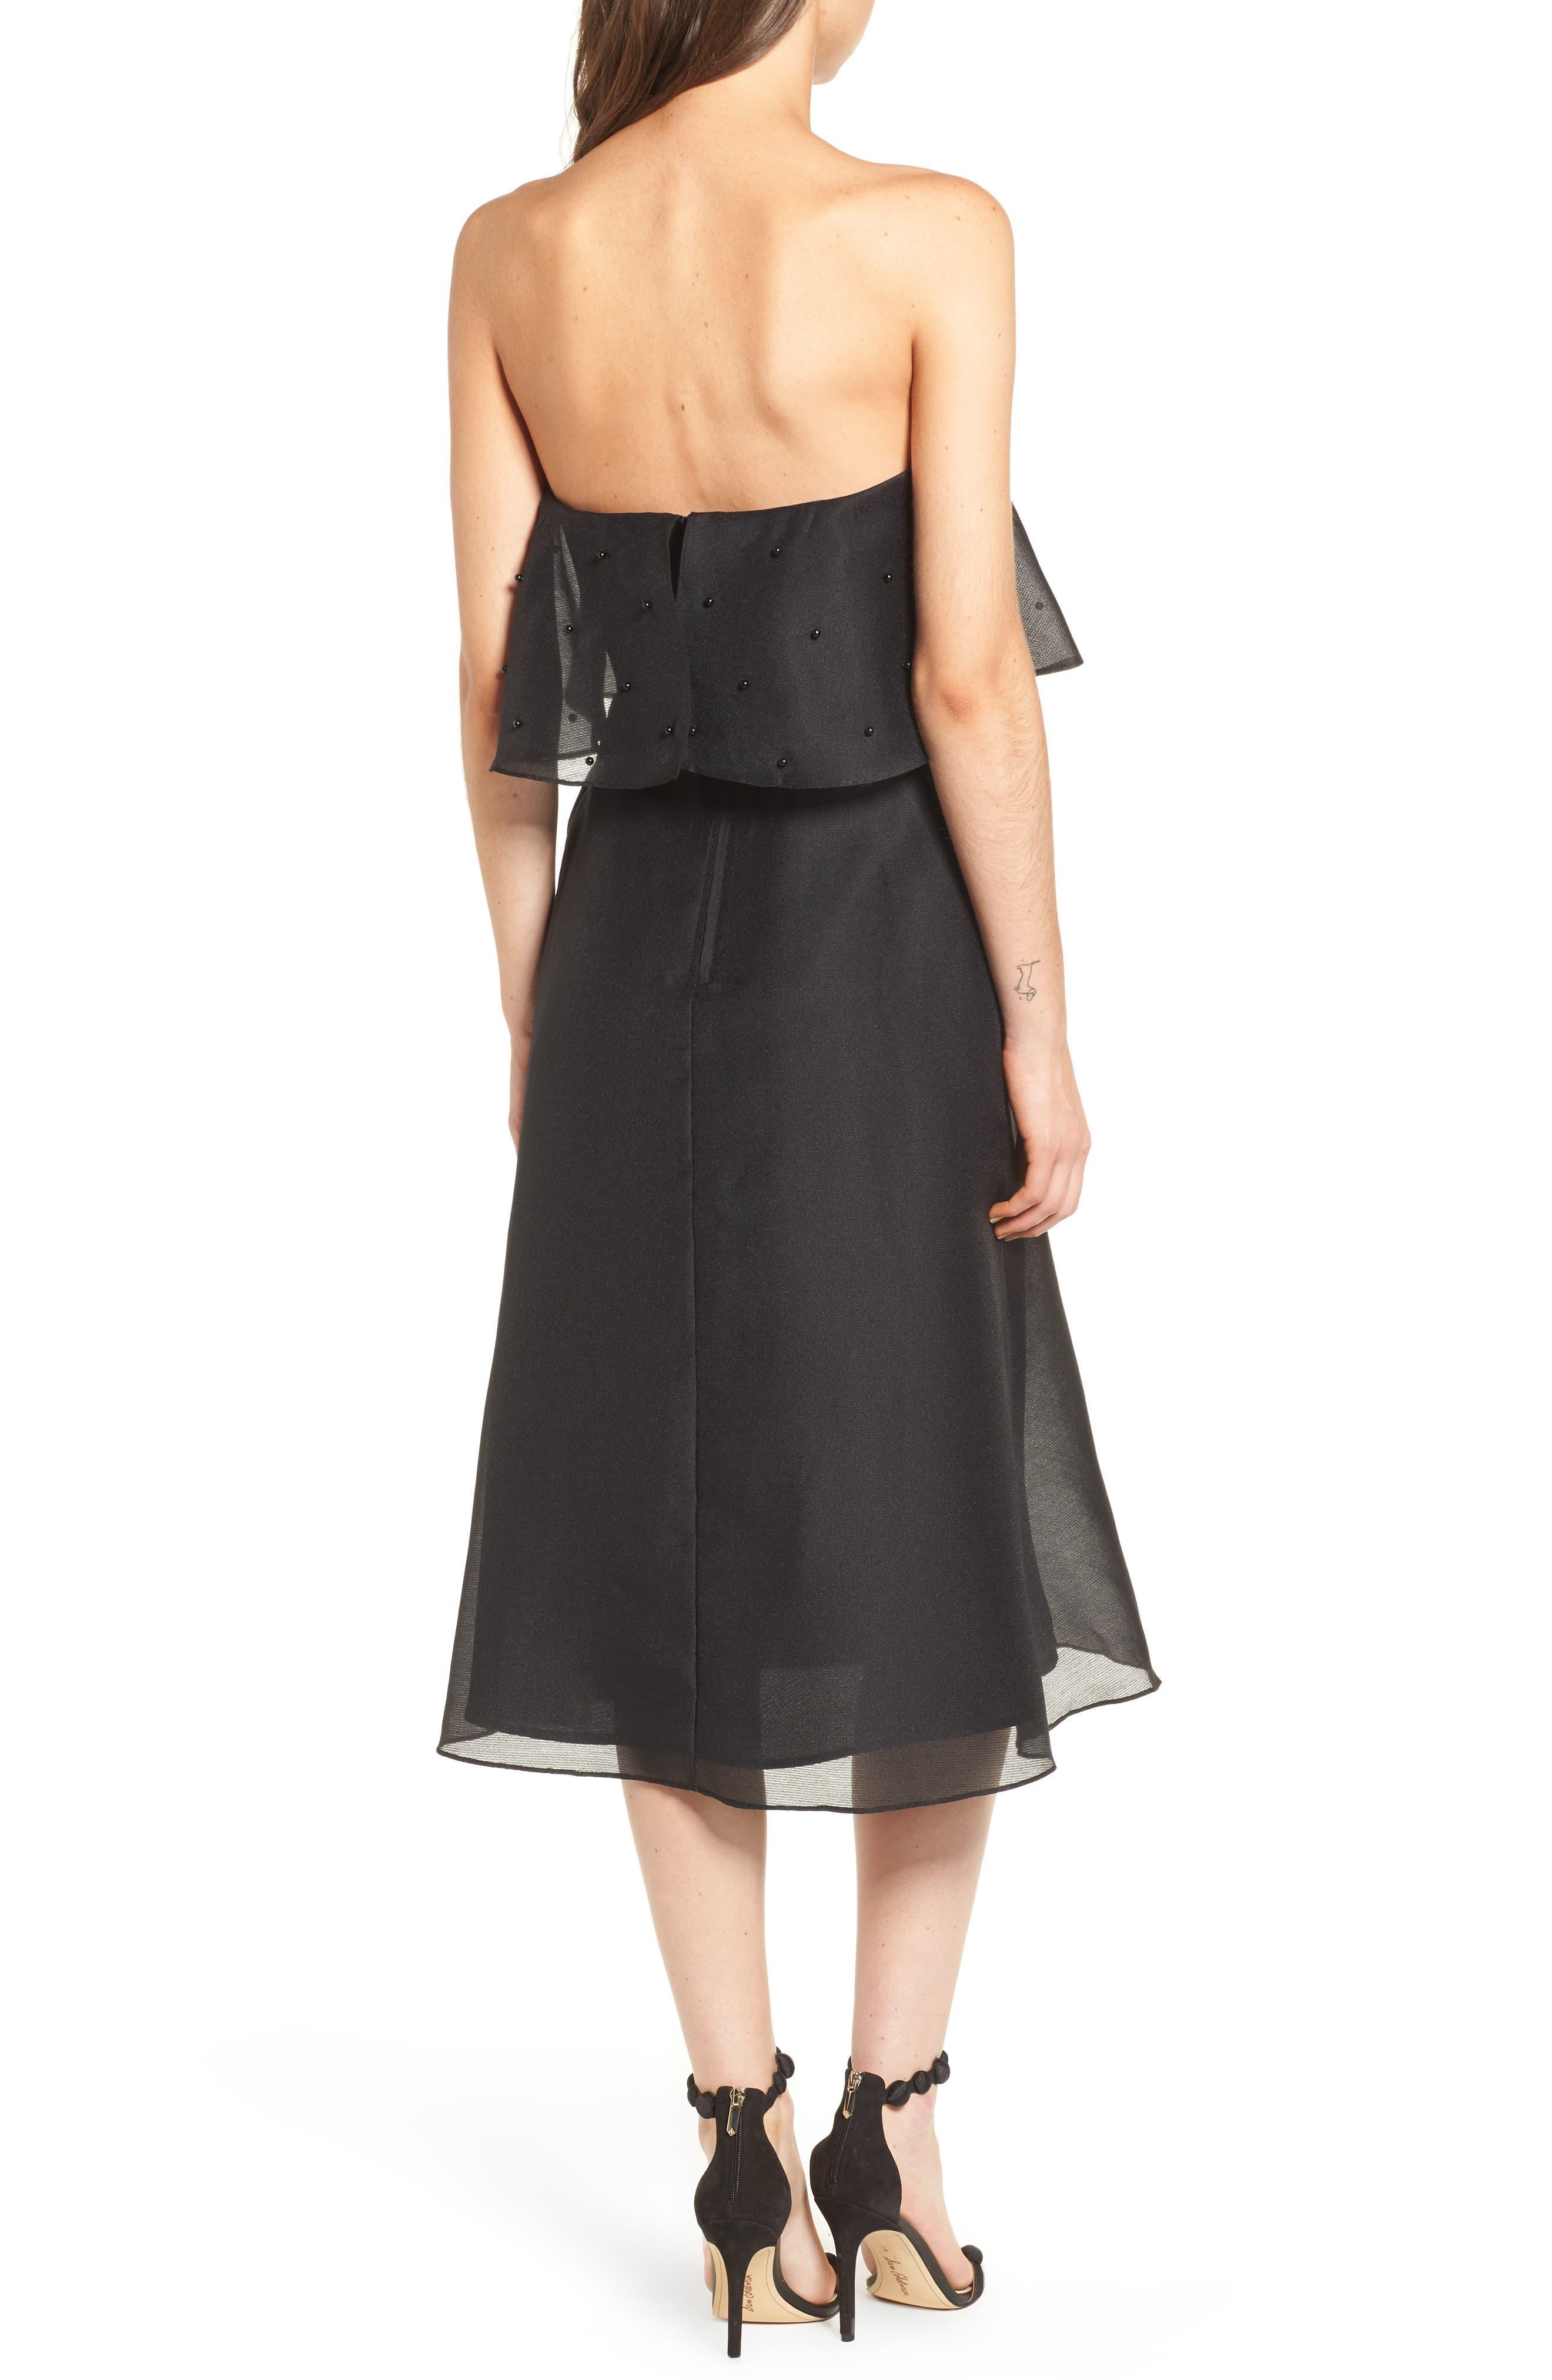 Call Me Strapless Dress,                             Alternate thumbnail 2, color,                             001